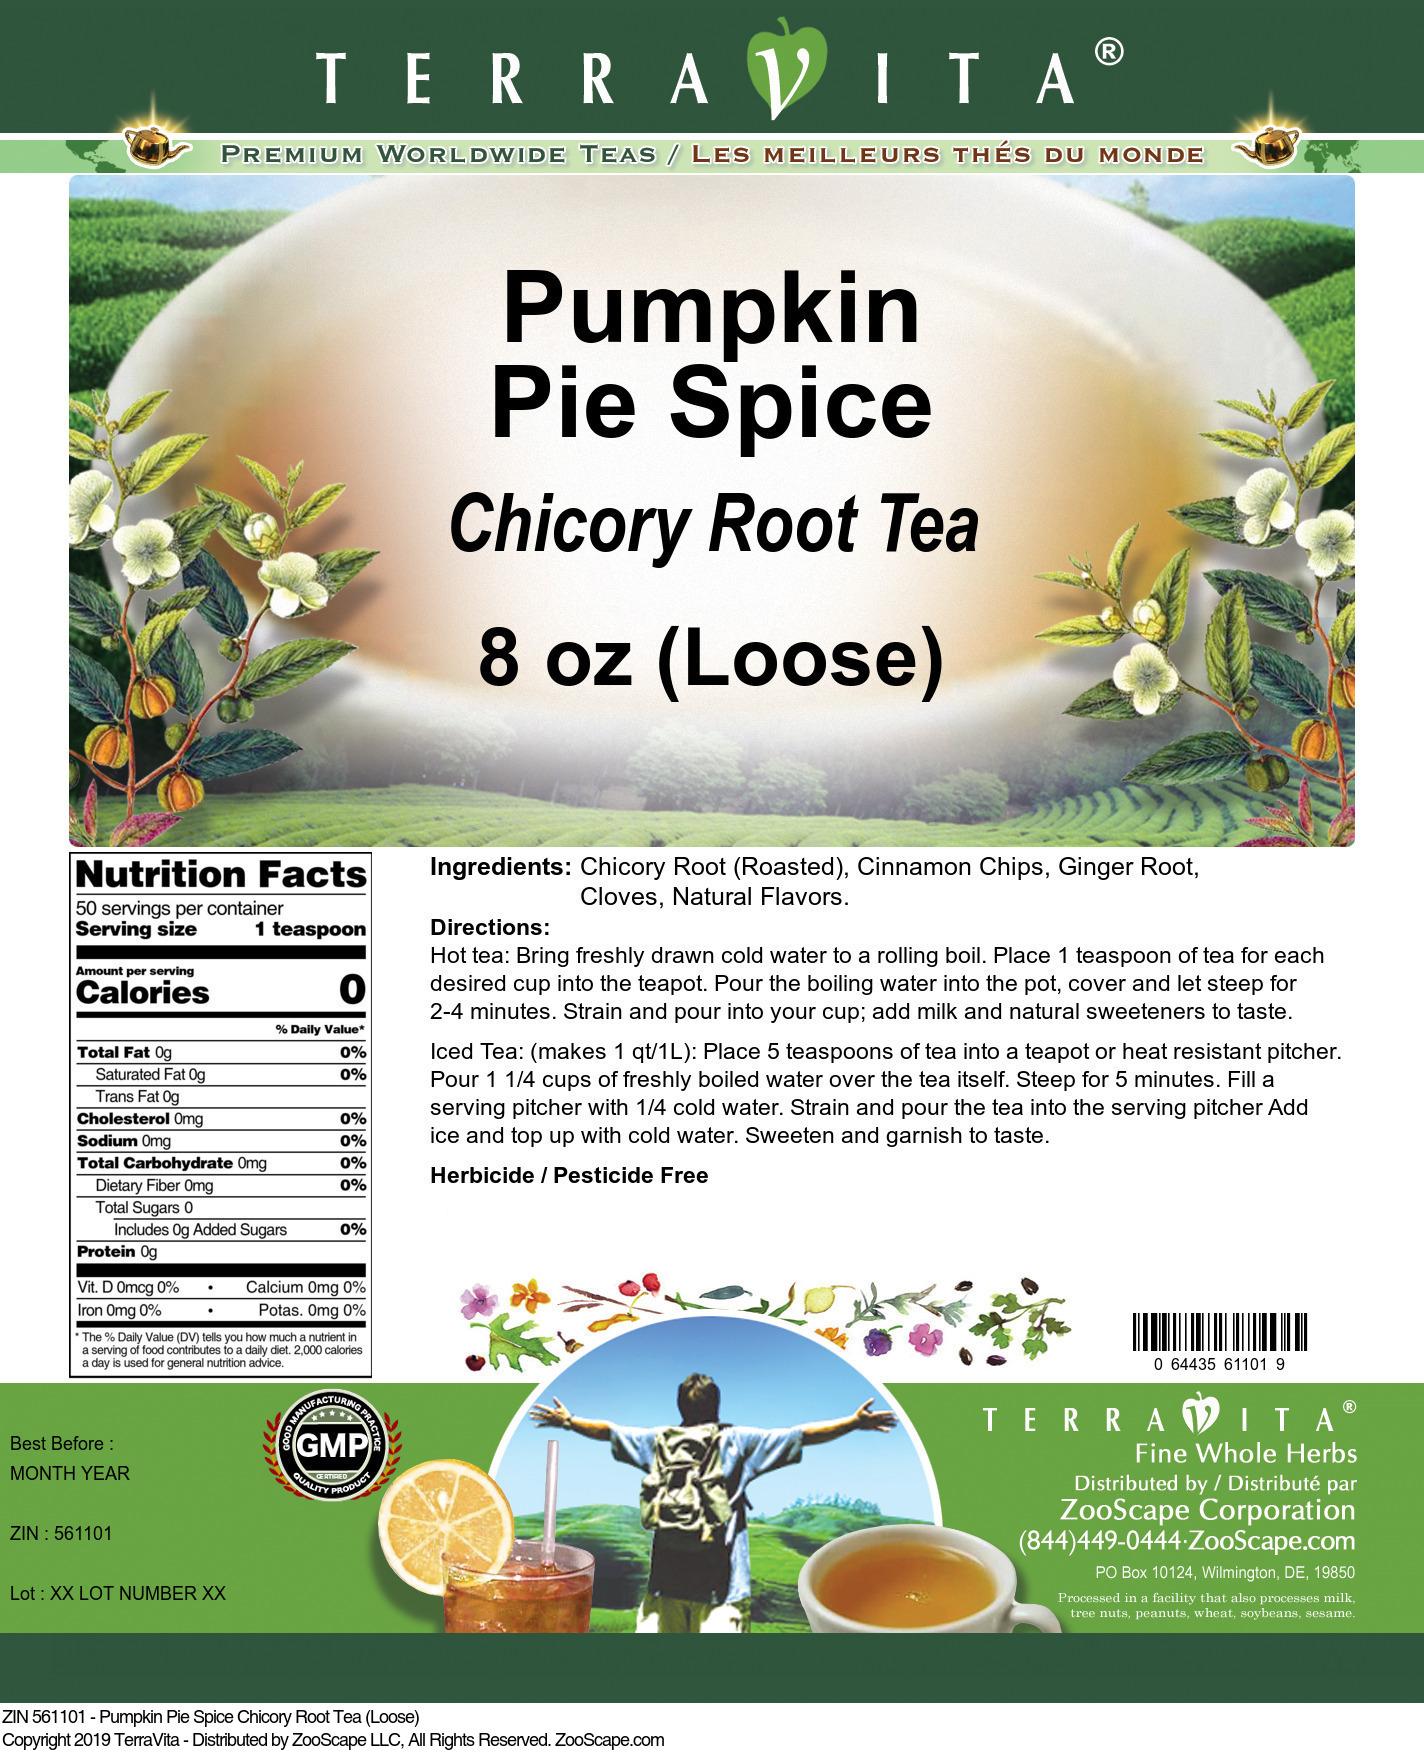 Pumpkin Pie Spice Chicory Root